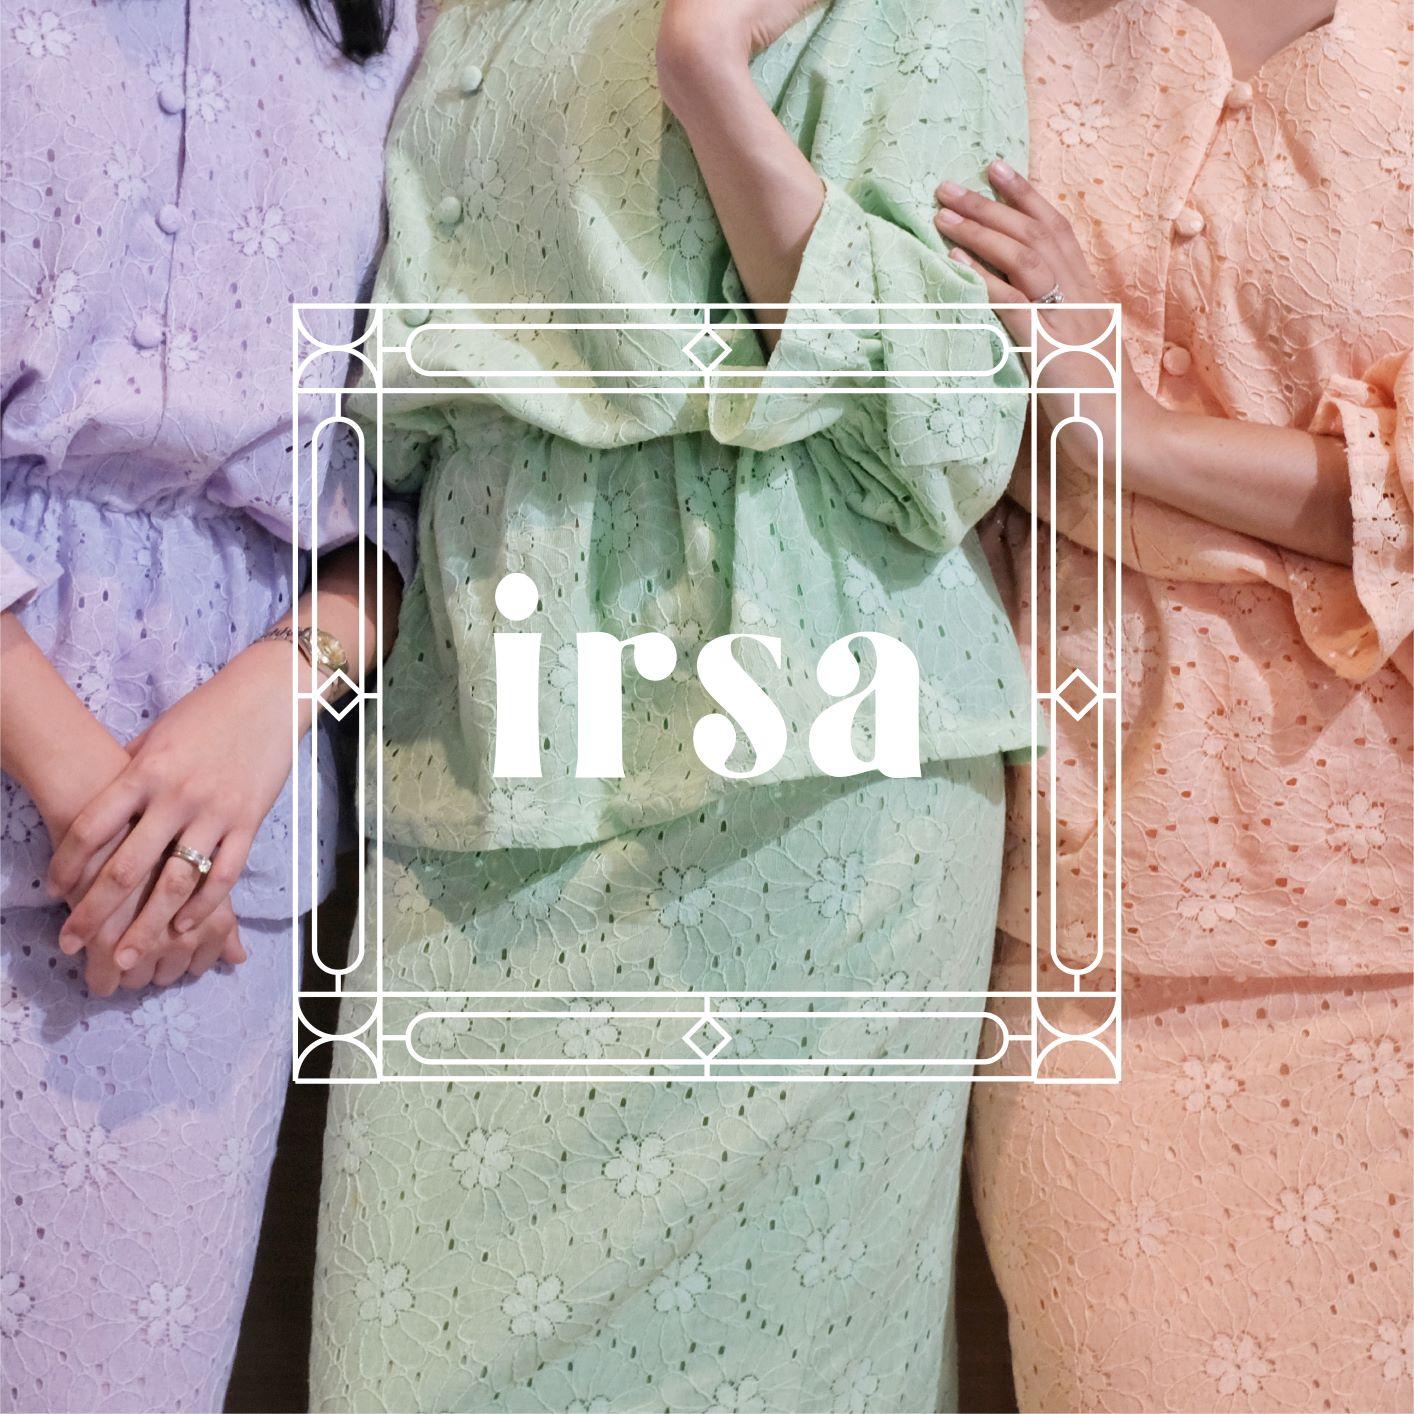 Irsa The Label